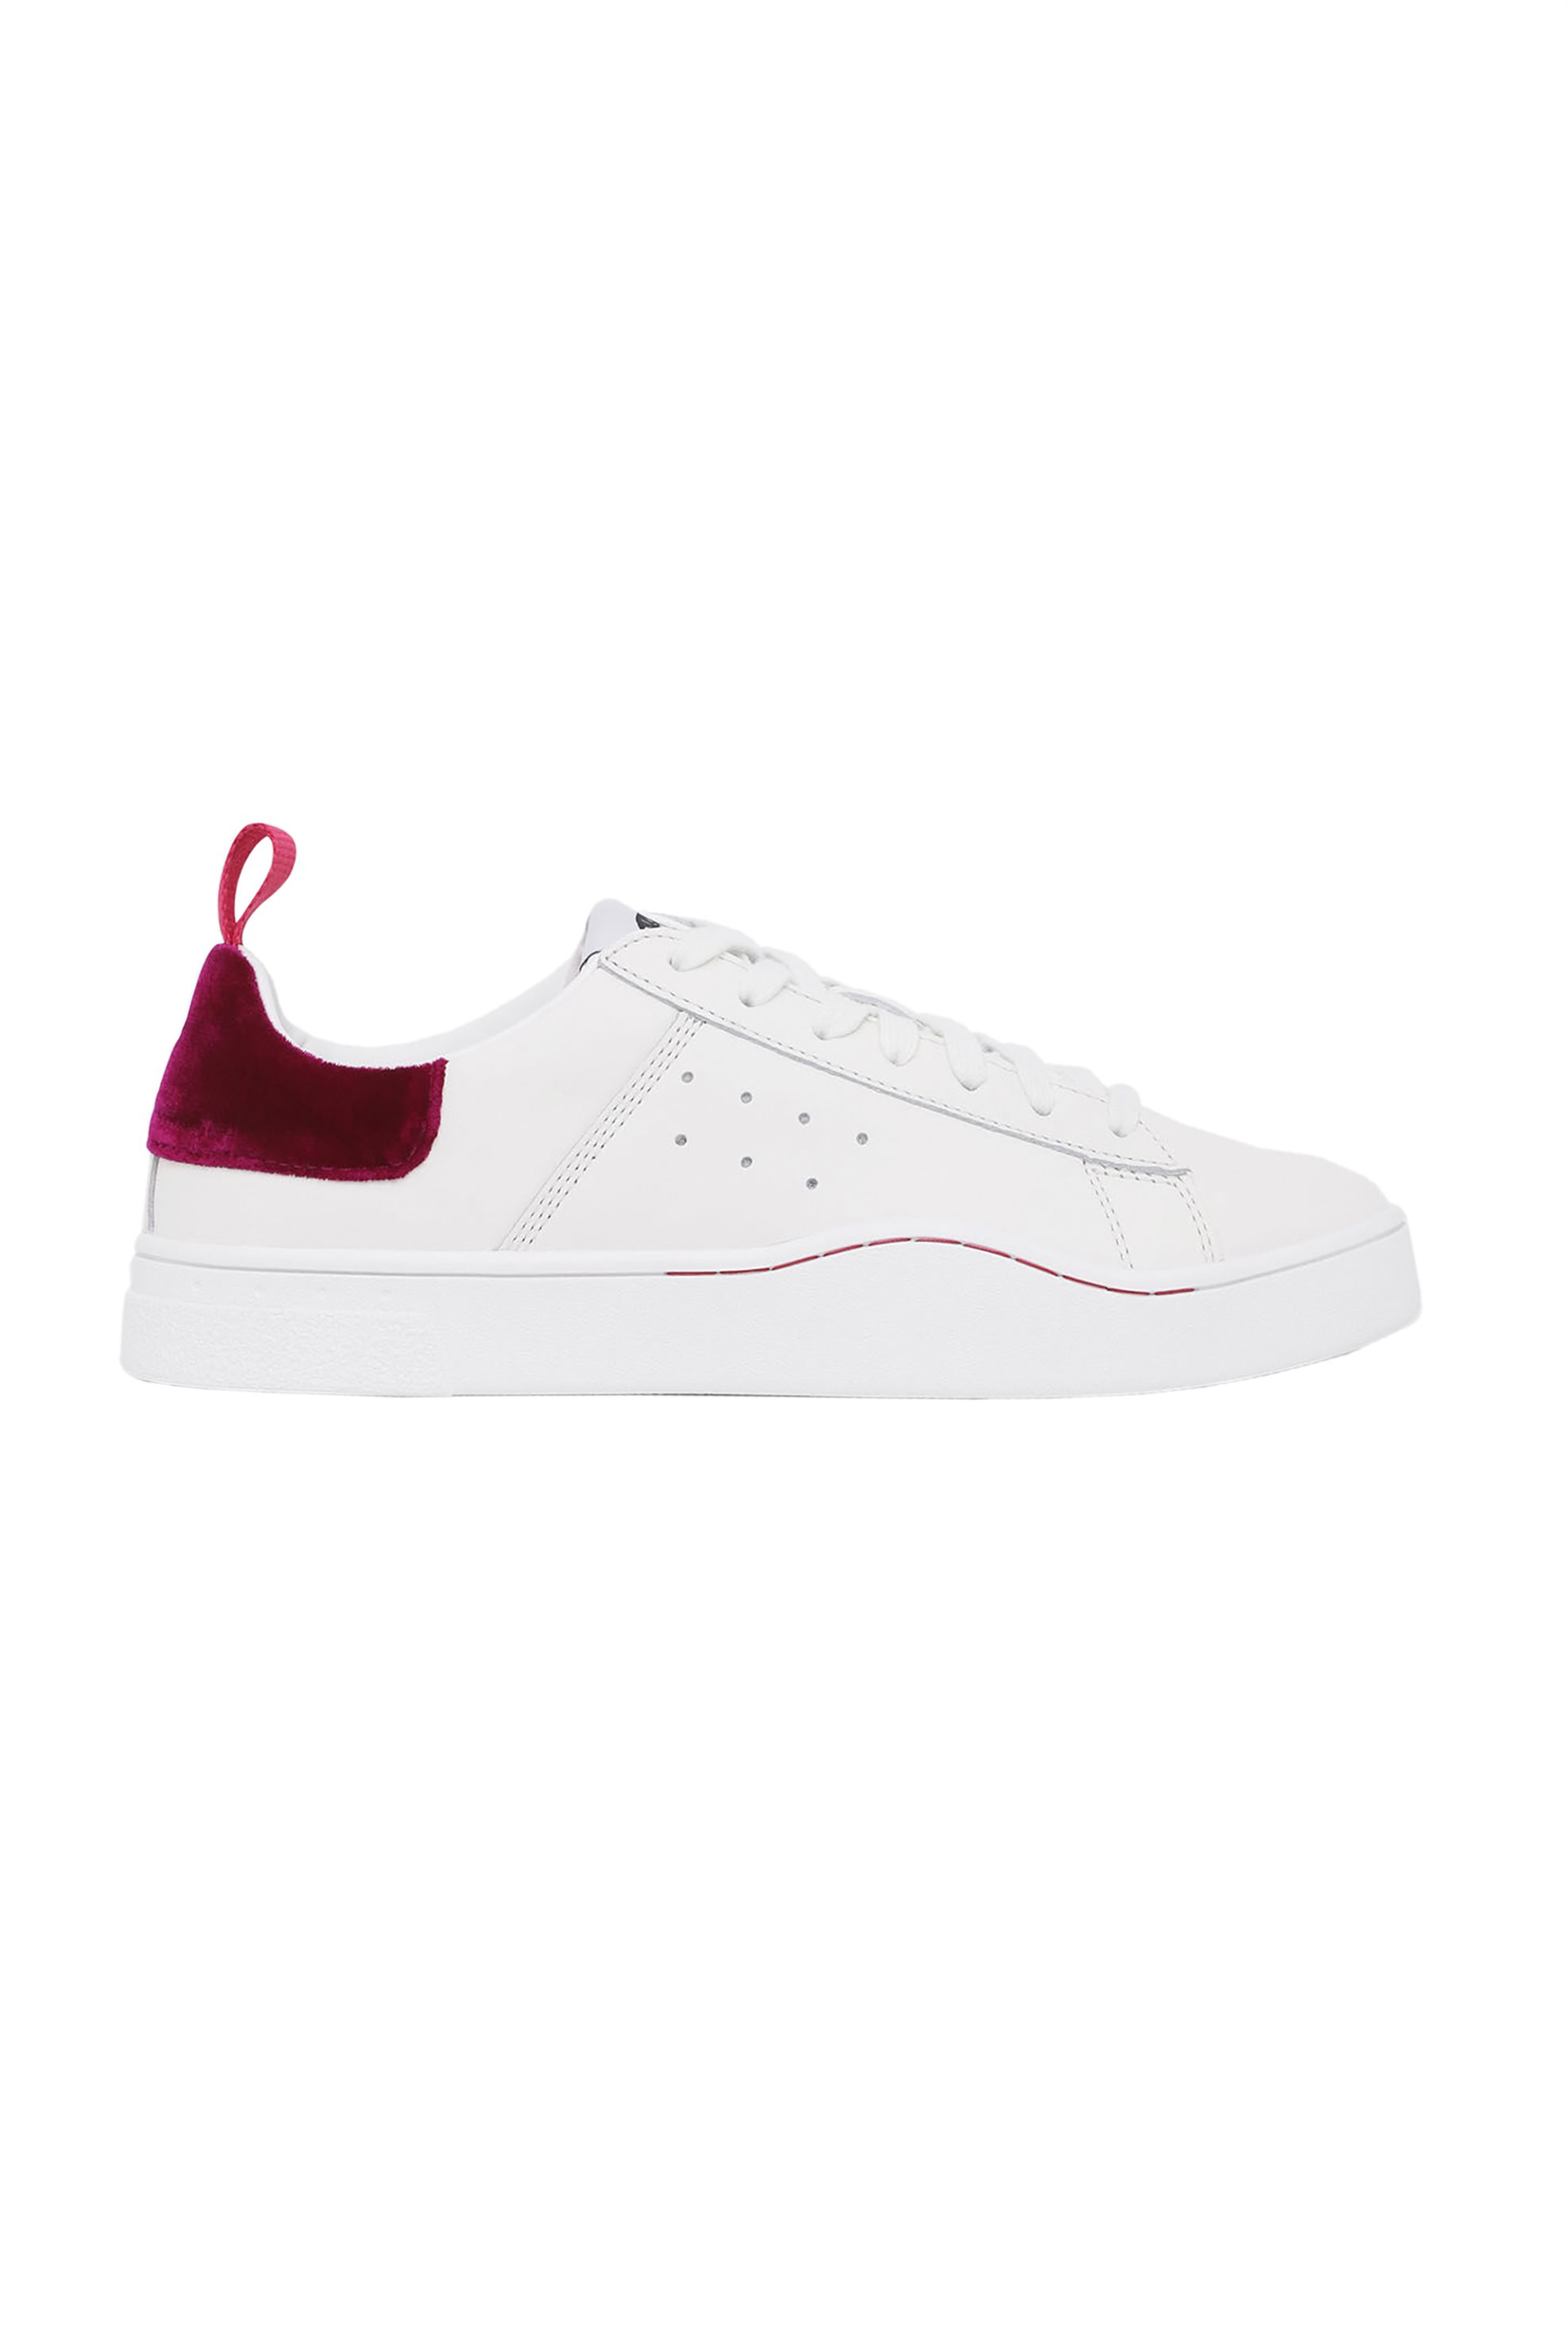 4daf09f7952 Γυναικεία παπούτσια Diesel γυναικεία sneakers με κορδόνια S Clever Low -  Y01752 P2086 - Λευκό | My Lady Shoes